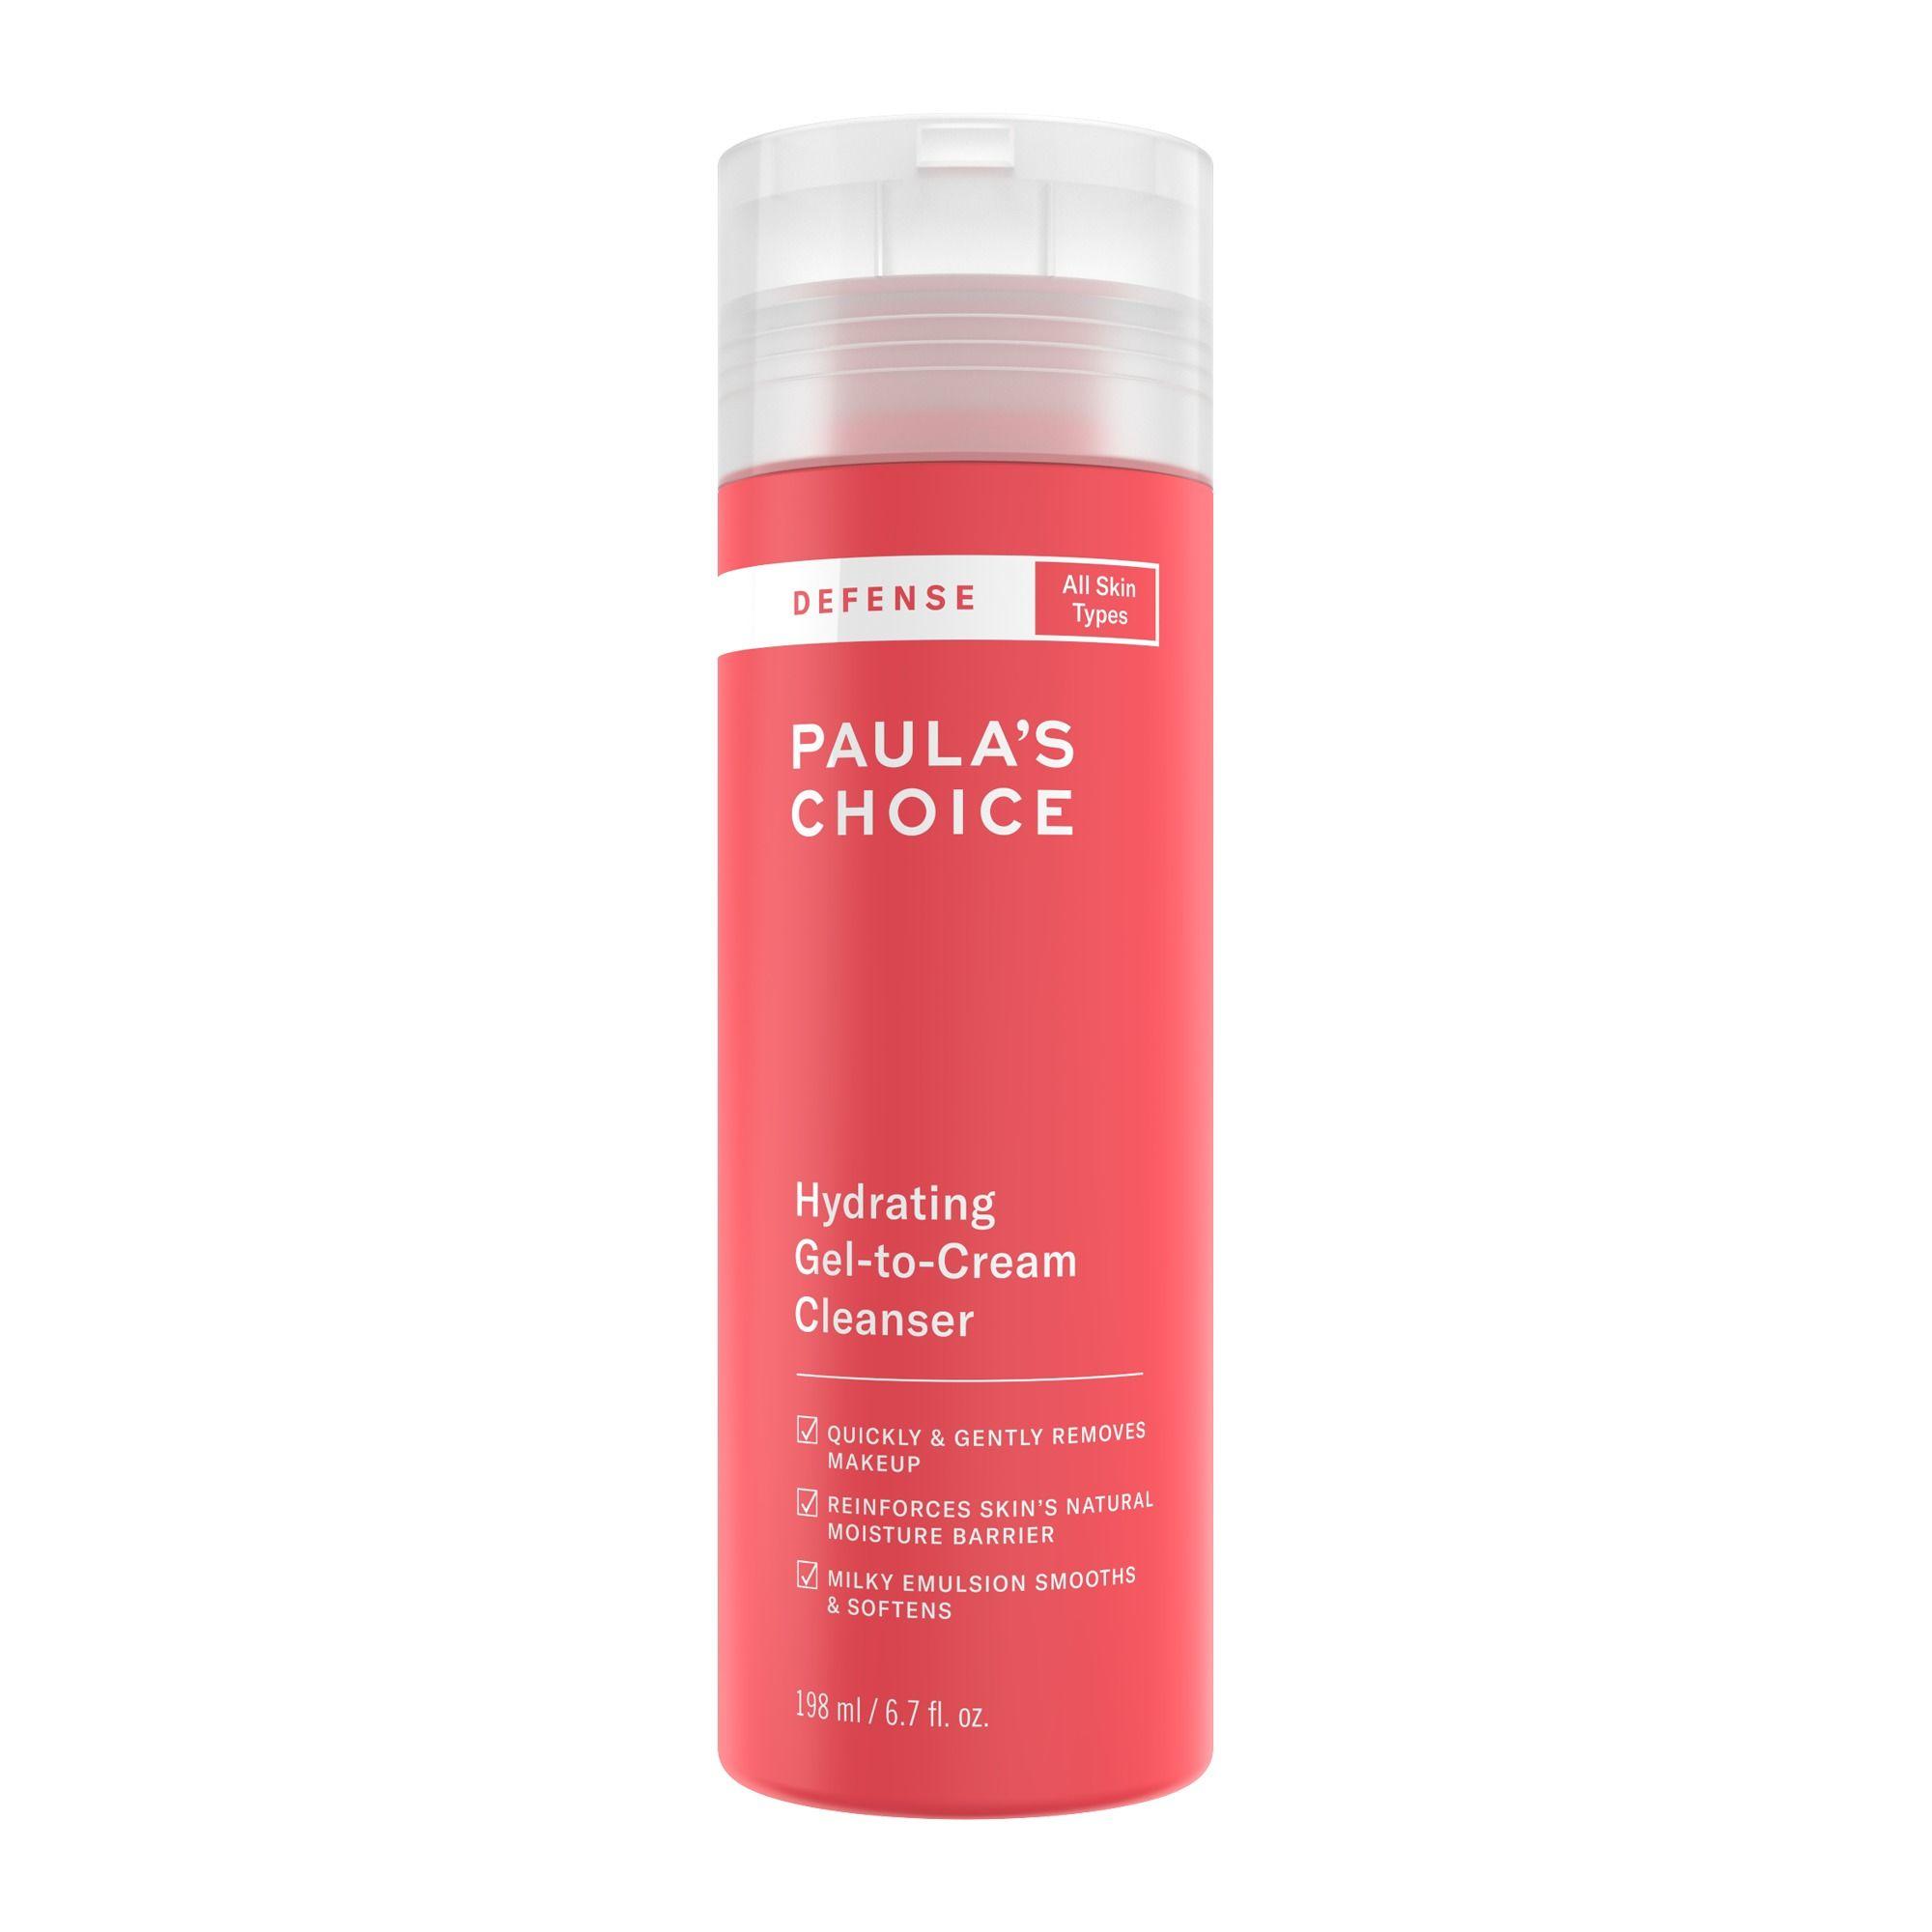 Paulas-Choice-DEFENSE-HYDRATING-GEL–TO–CREAM-CLEANSER